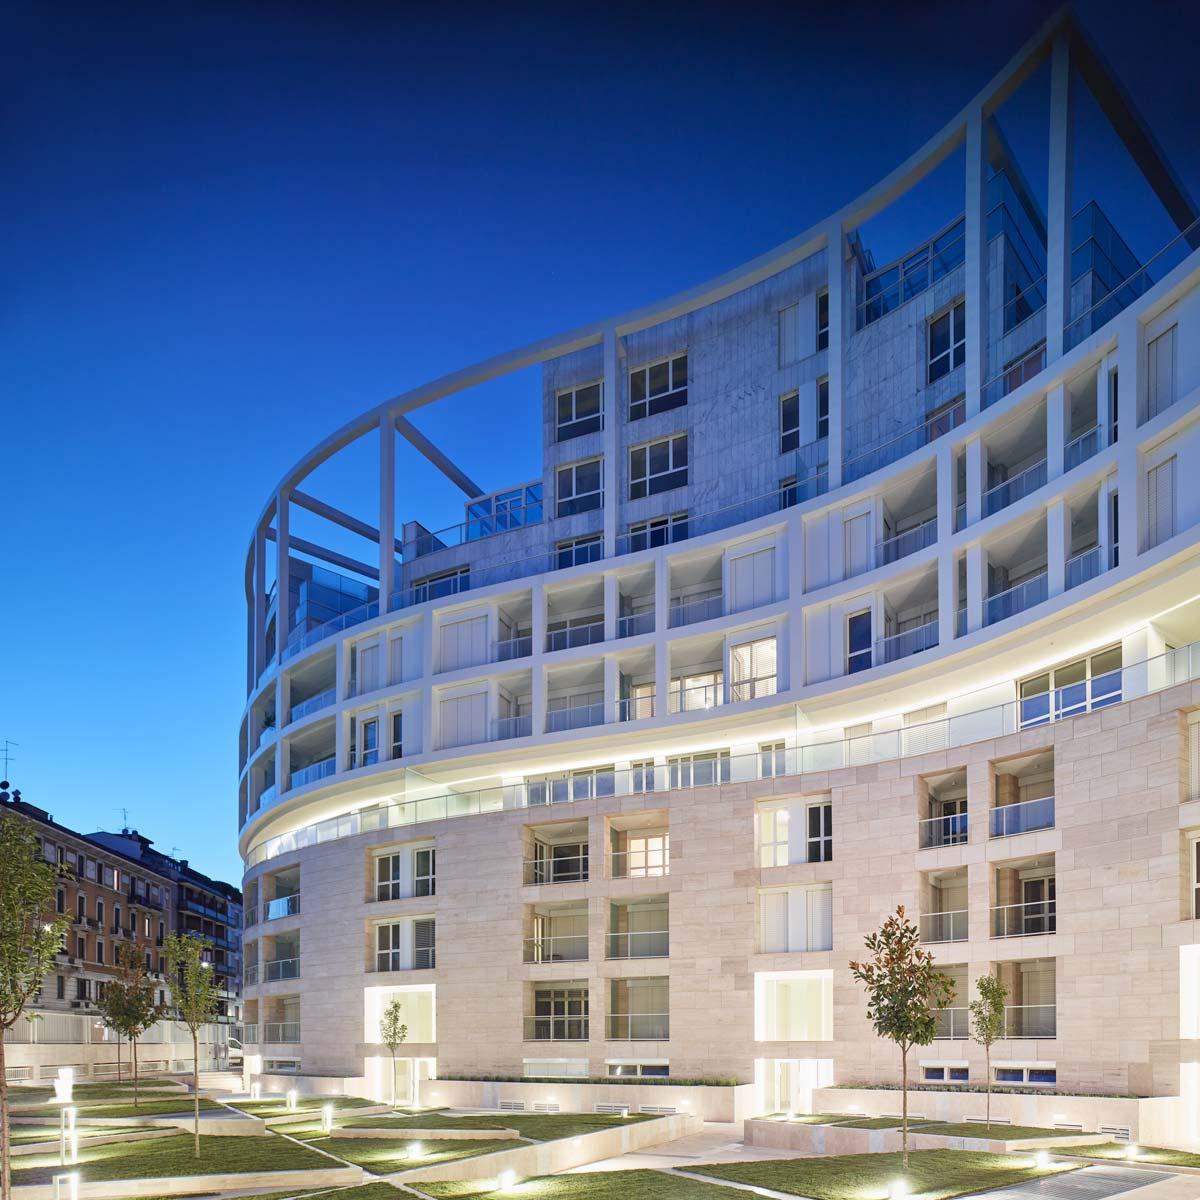 Degli-Esposti-Architetti-Milan-Residenze-Carlo-Erba-07